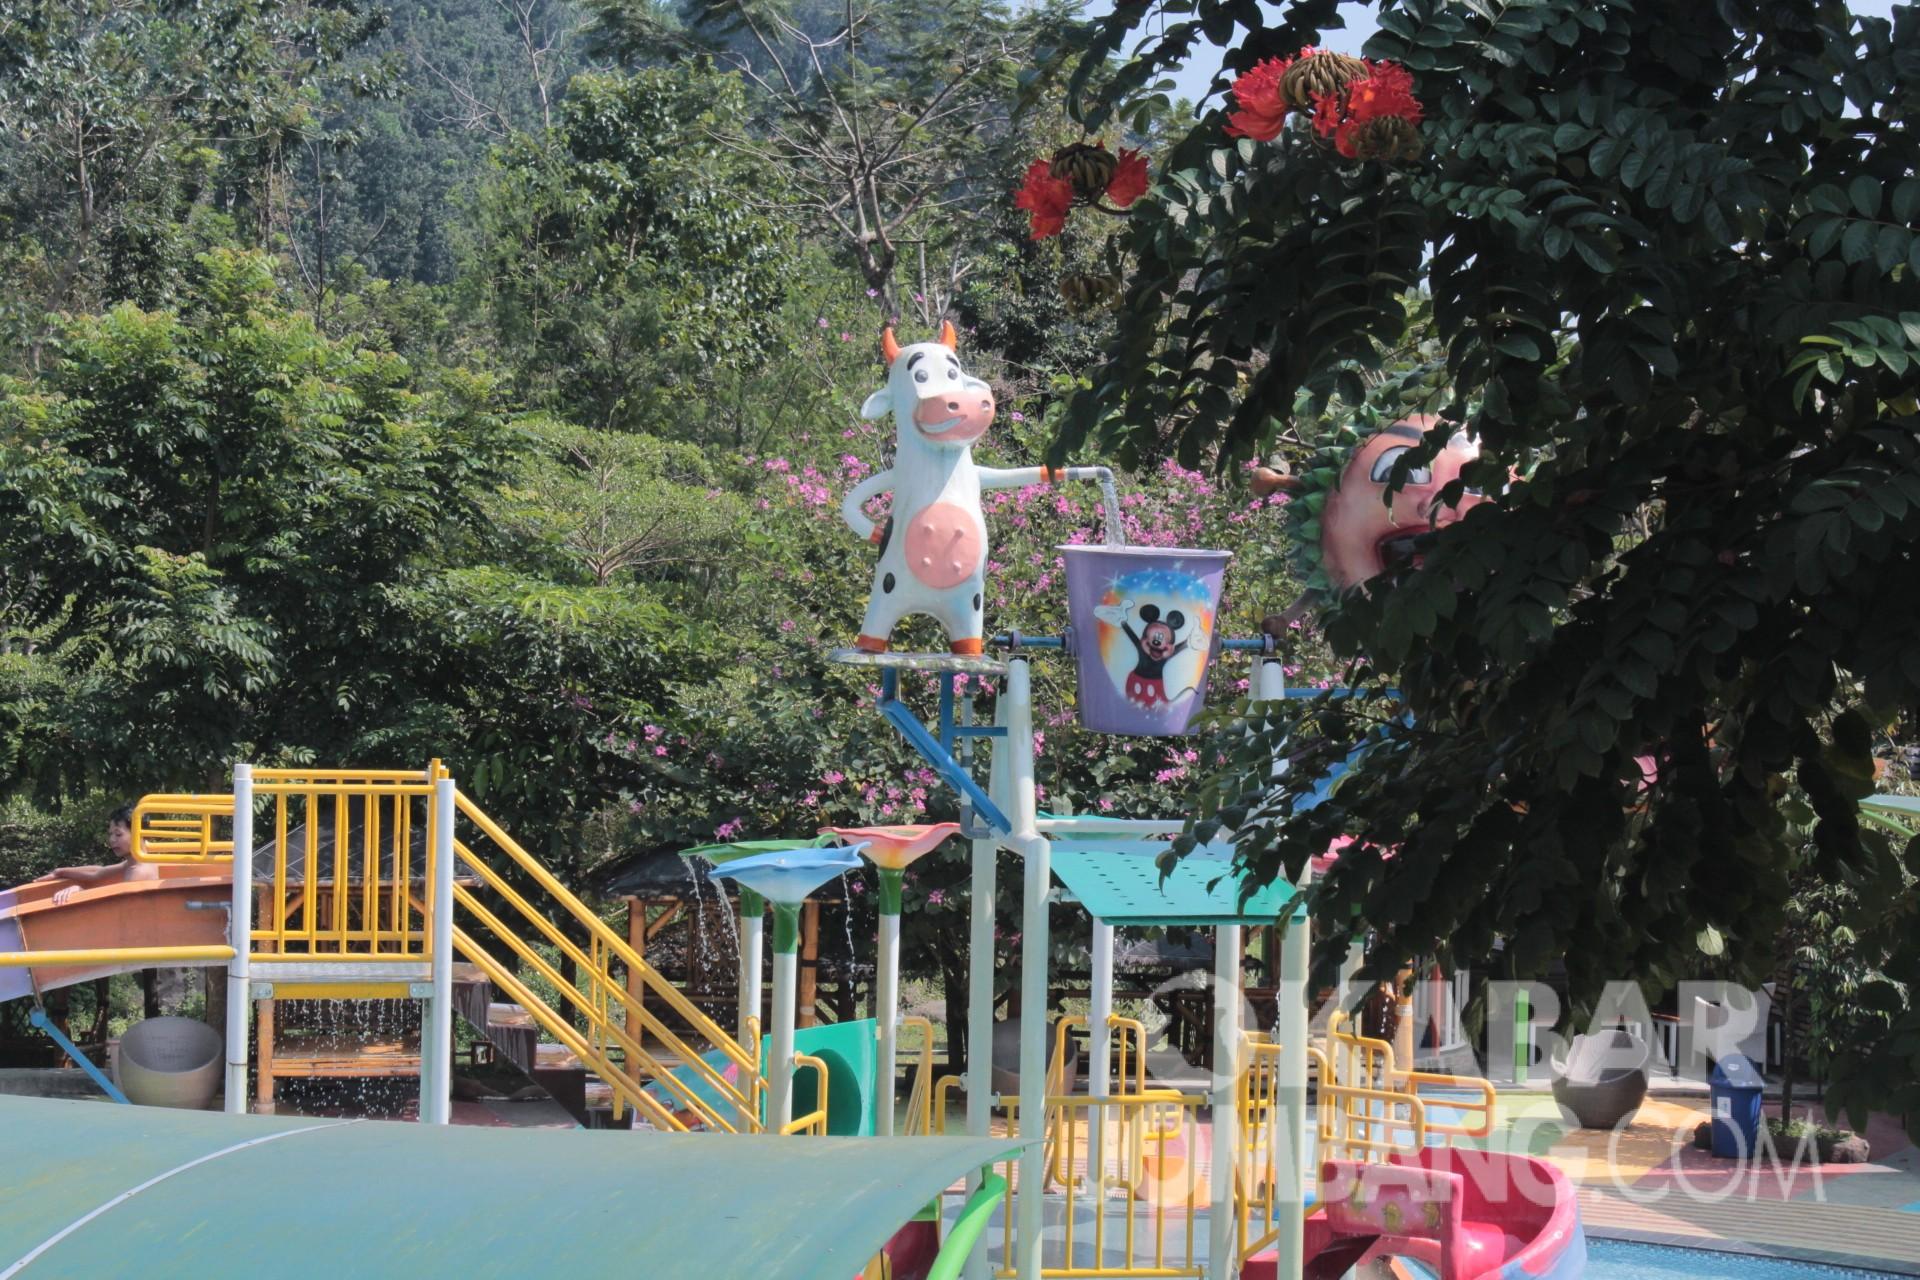 Tempat Wisata Terbaru di Jombang Ramai Dikunjungi Wisatawan